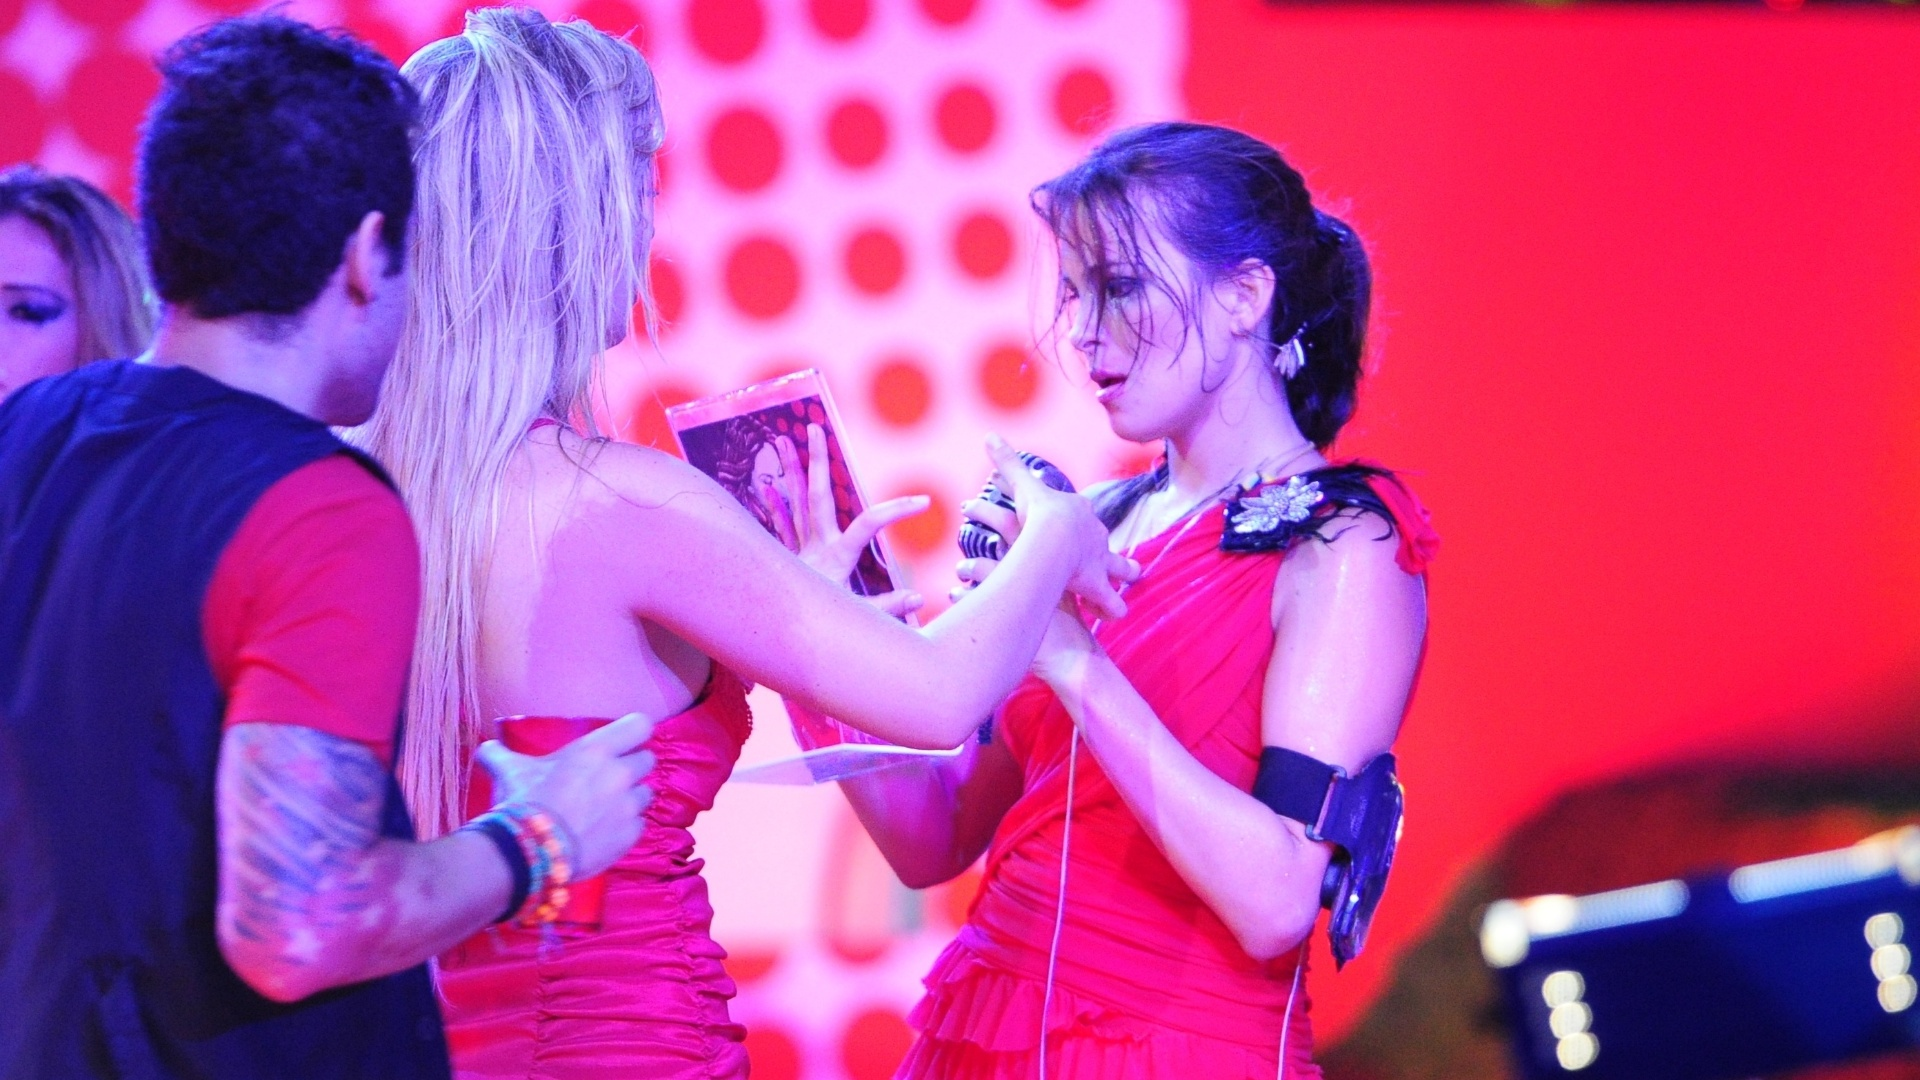 13.fev.2013 - Fernanda e Kamilla dançam juntas na festa